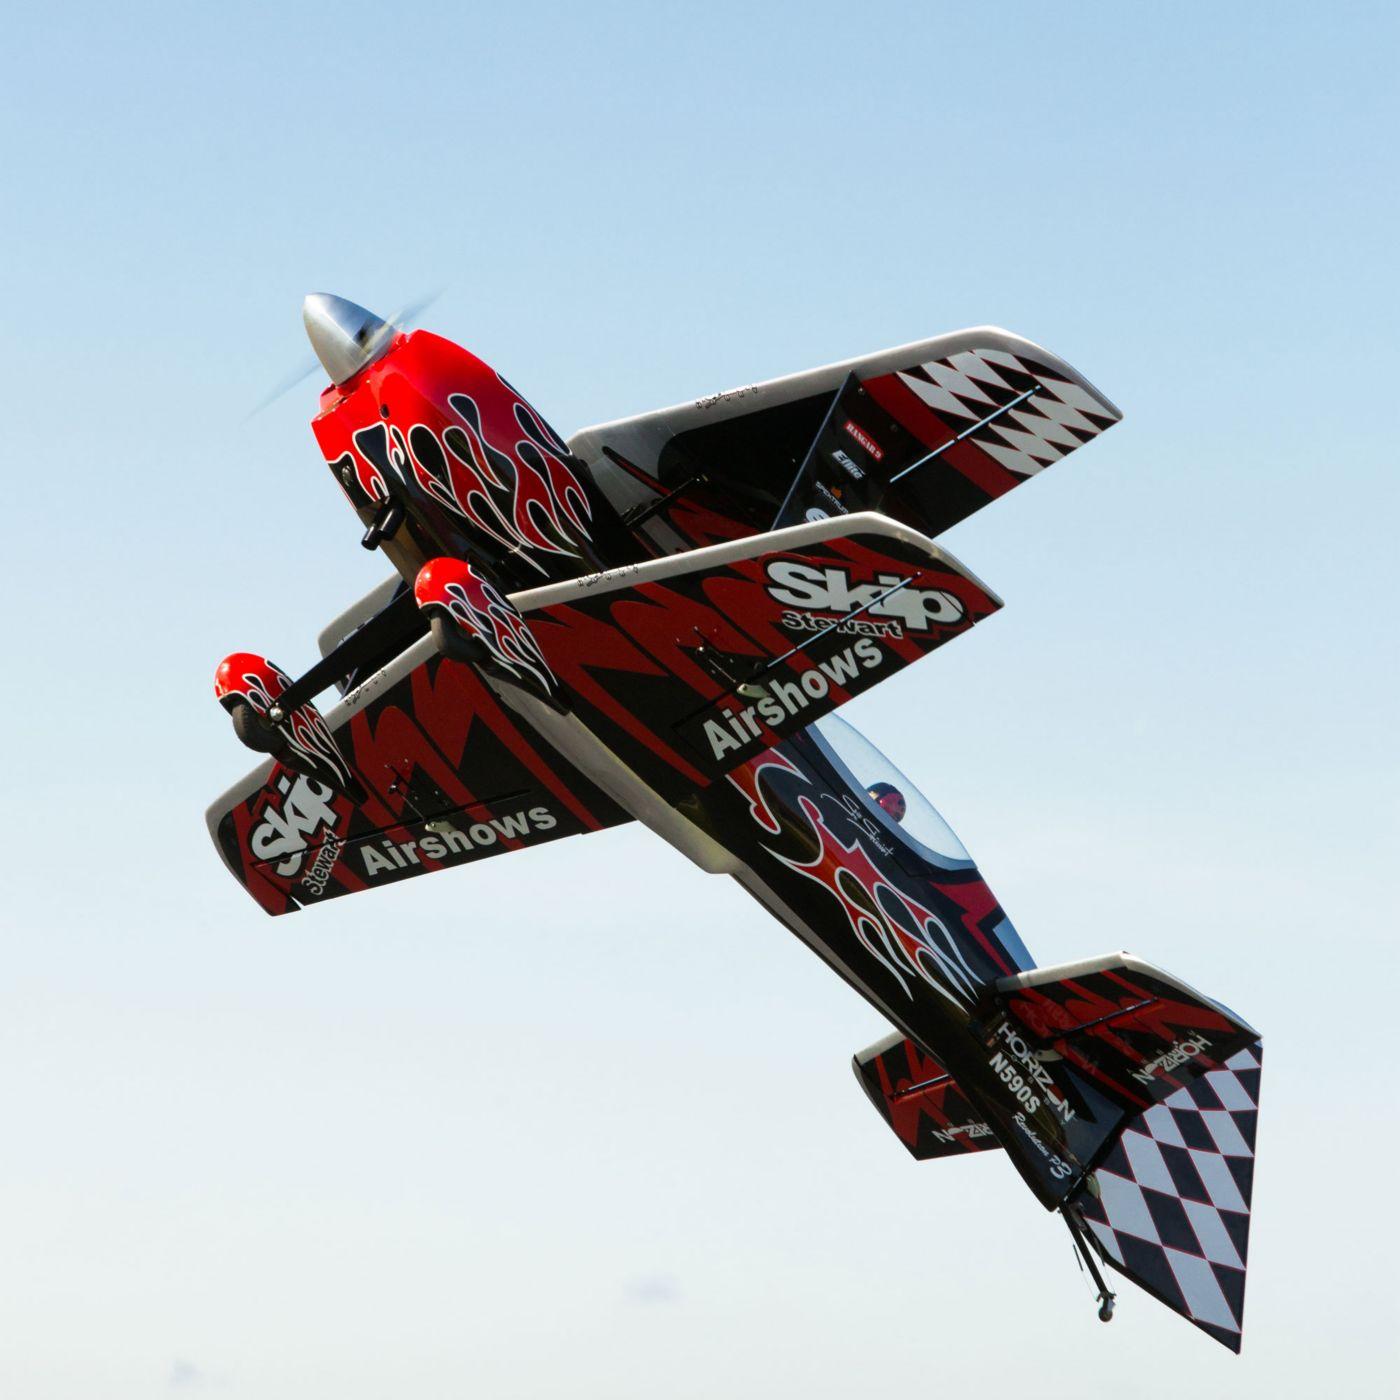 P3 Revolution hangar 9